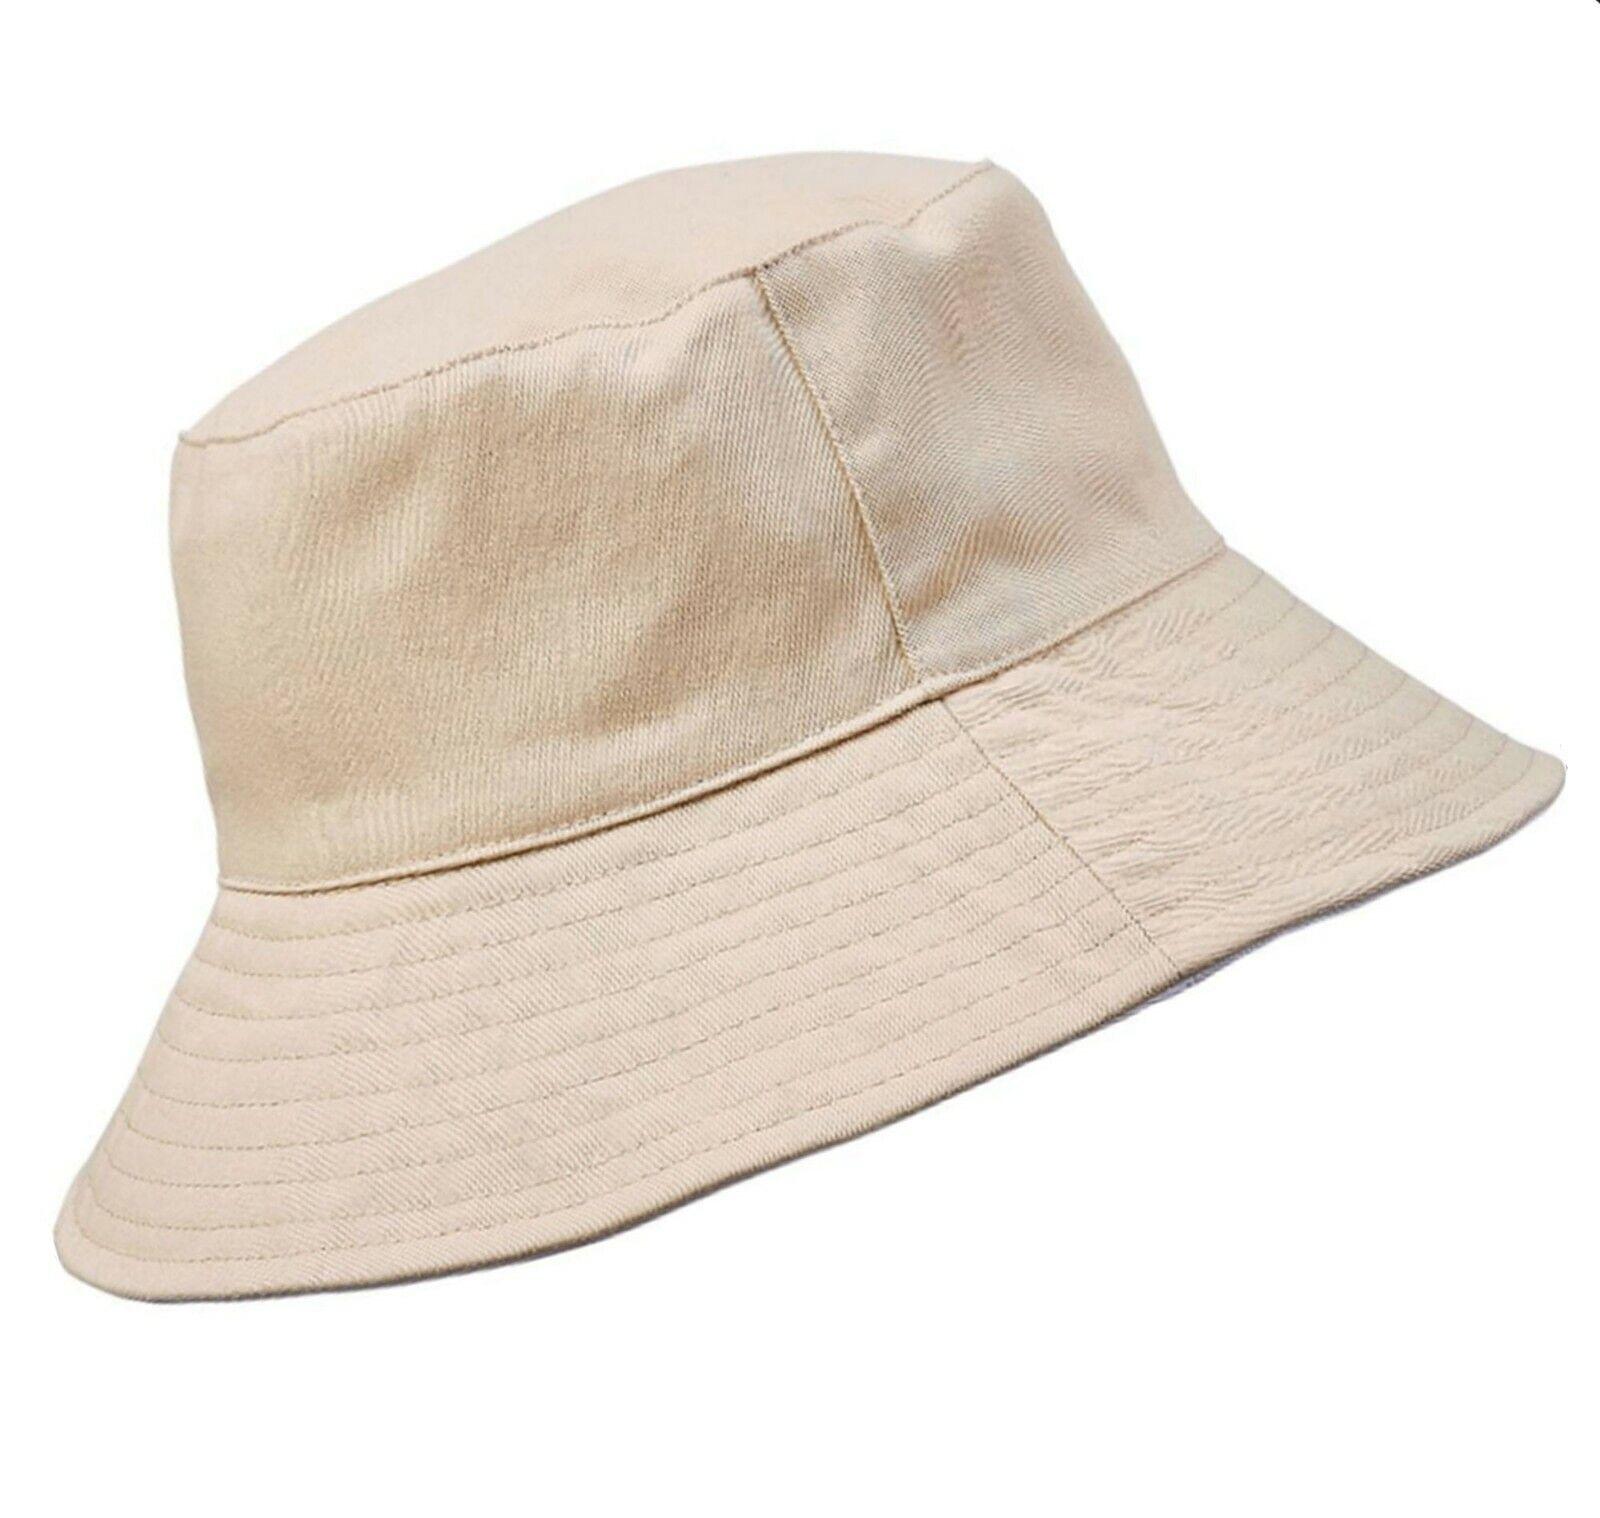 Elegant Fragrant Gardenia Summer Unisex Fishing Sun Top Bucket Hats for Kid Teens Women and Men with Packable Fisherman Cap for Outdoor Baseball Sport Picnic